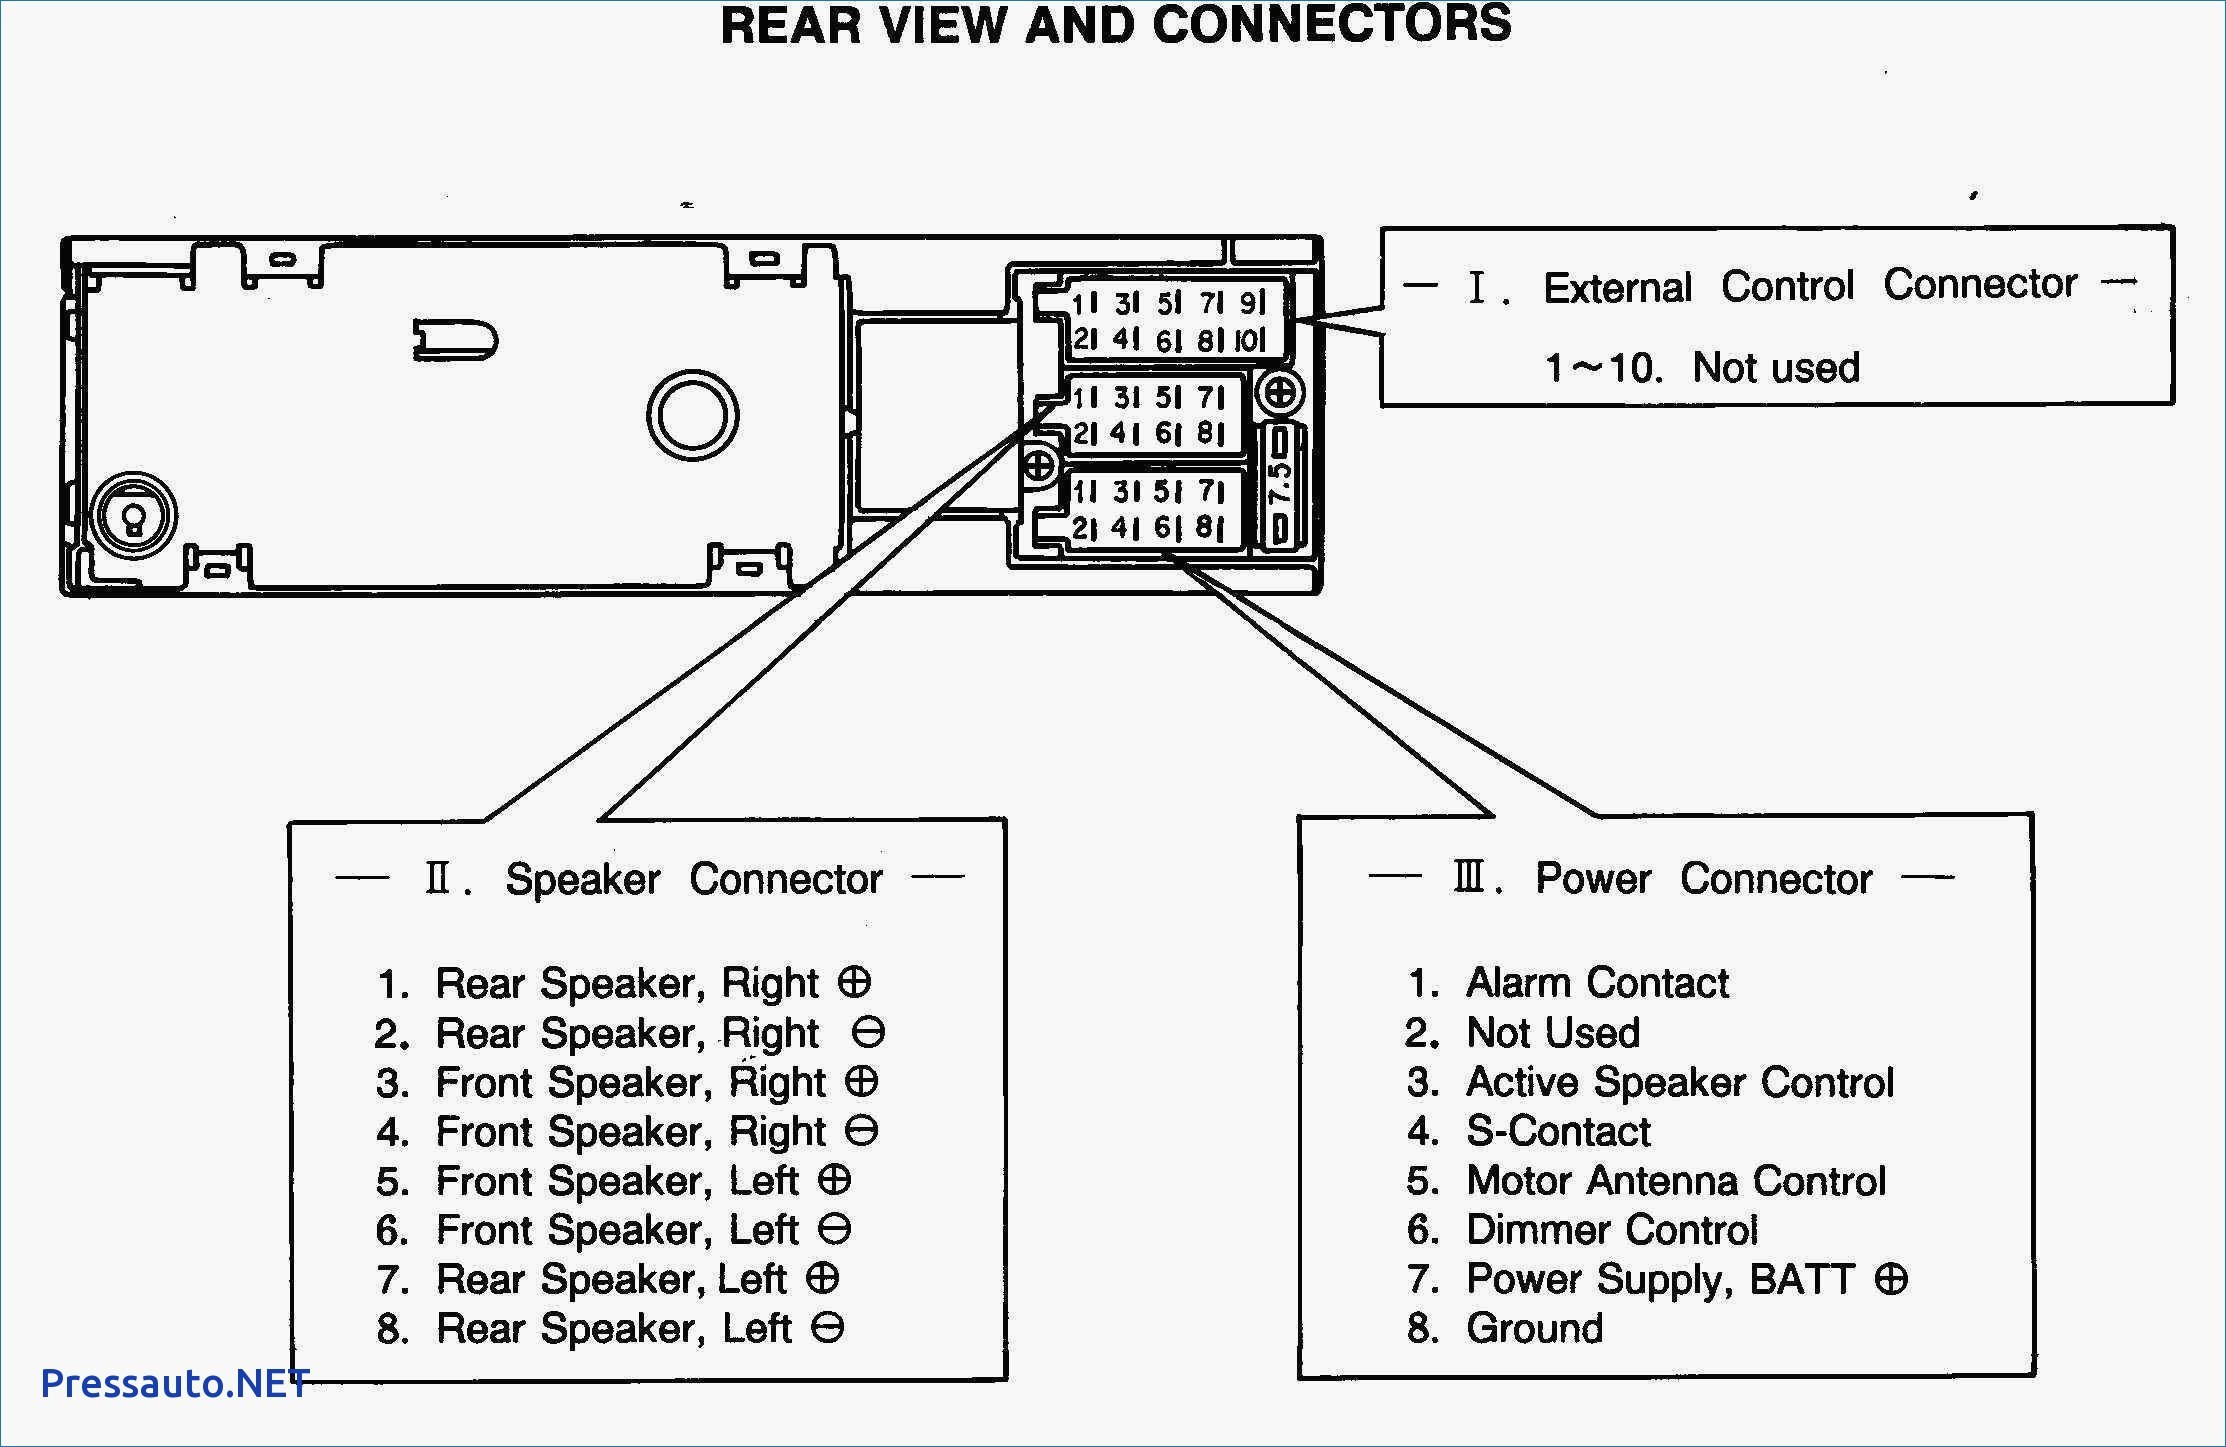 Hyundai Car Stereo Wiring Diagram Beautiful aftermarket Radio Wiring Diagram Diagram Of Hyundai Car Stereo Wiring Diagram